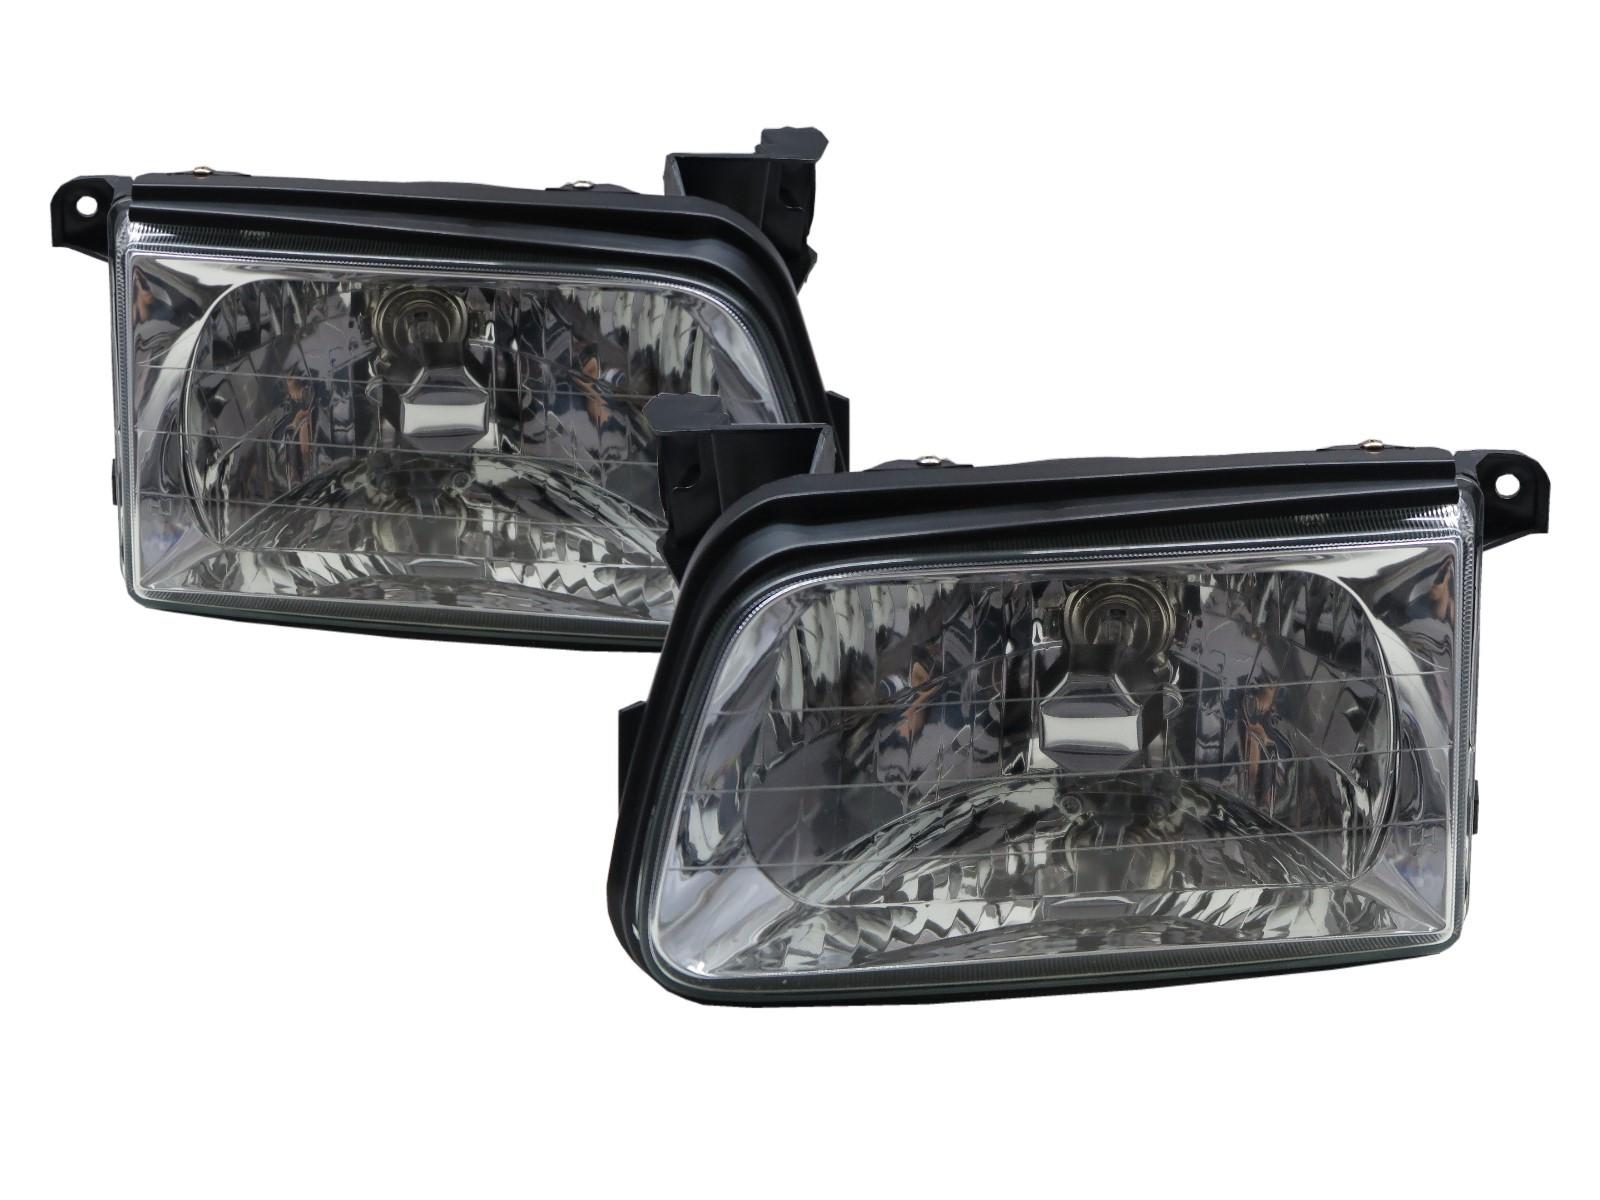 CrazyTheGod Dragon Power 2000-2002 Pickup Truck/Ute/Bakkie 4D Clear Glass Headlight Headlamp Chrome for ISUZU LHD